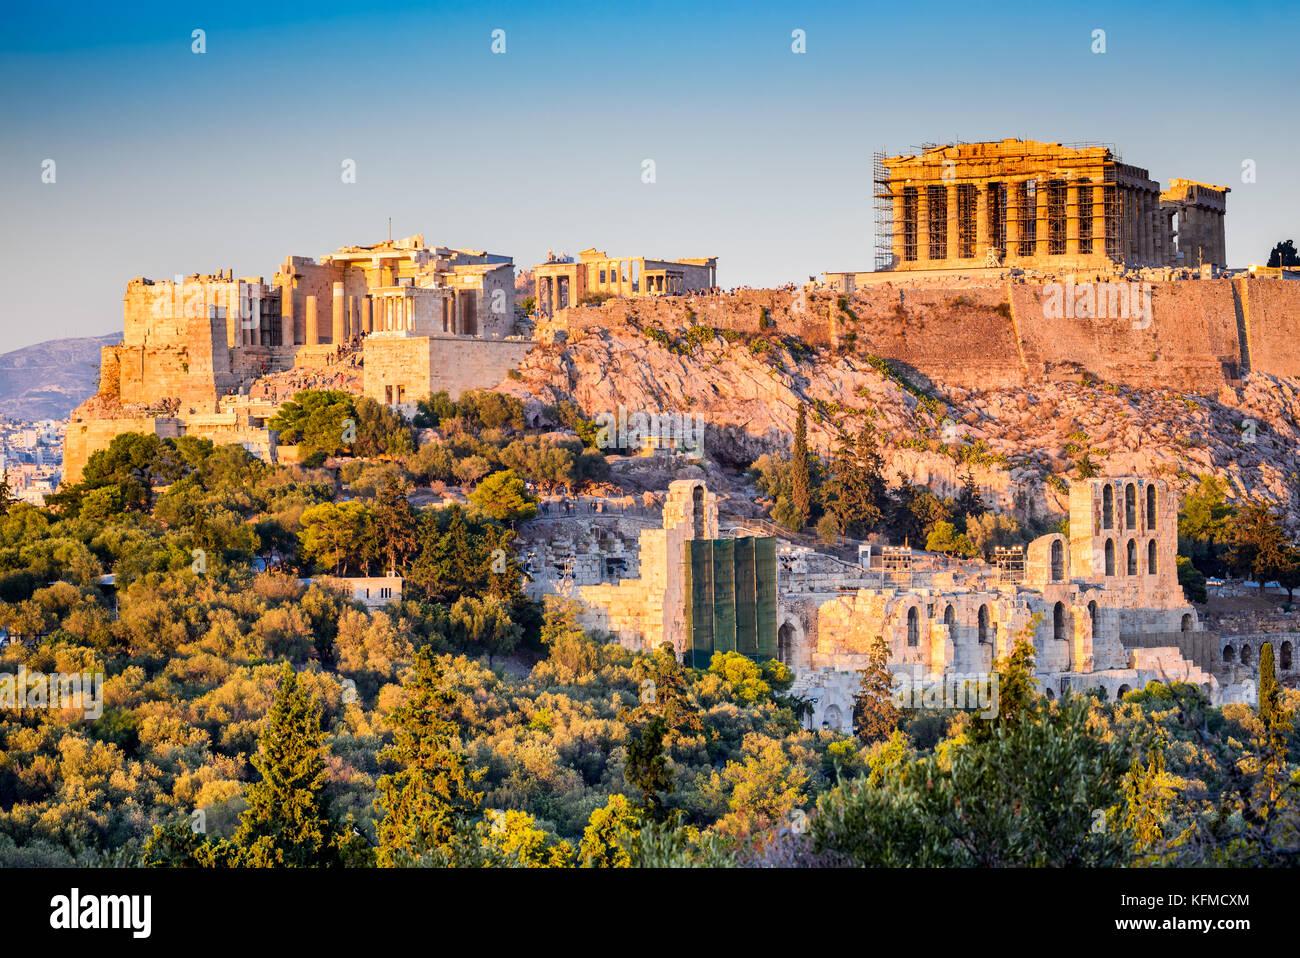 Athens, Greece. Acropolis, ancient ruins of Greek Civilization citadel with Parthenon temple. - Stock Image